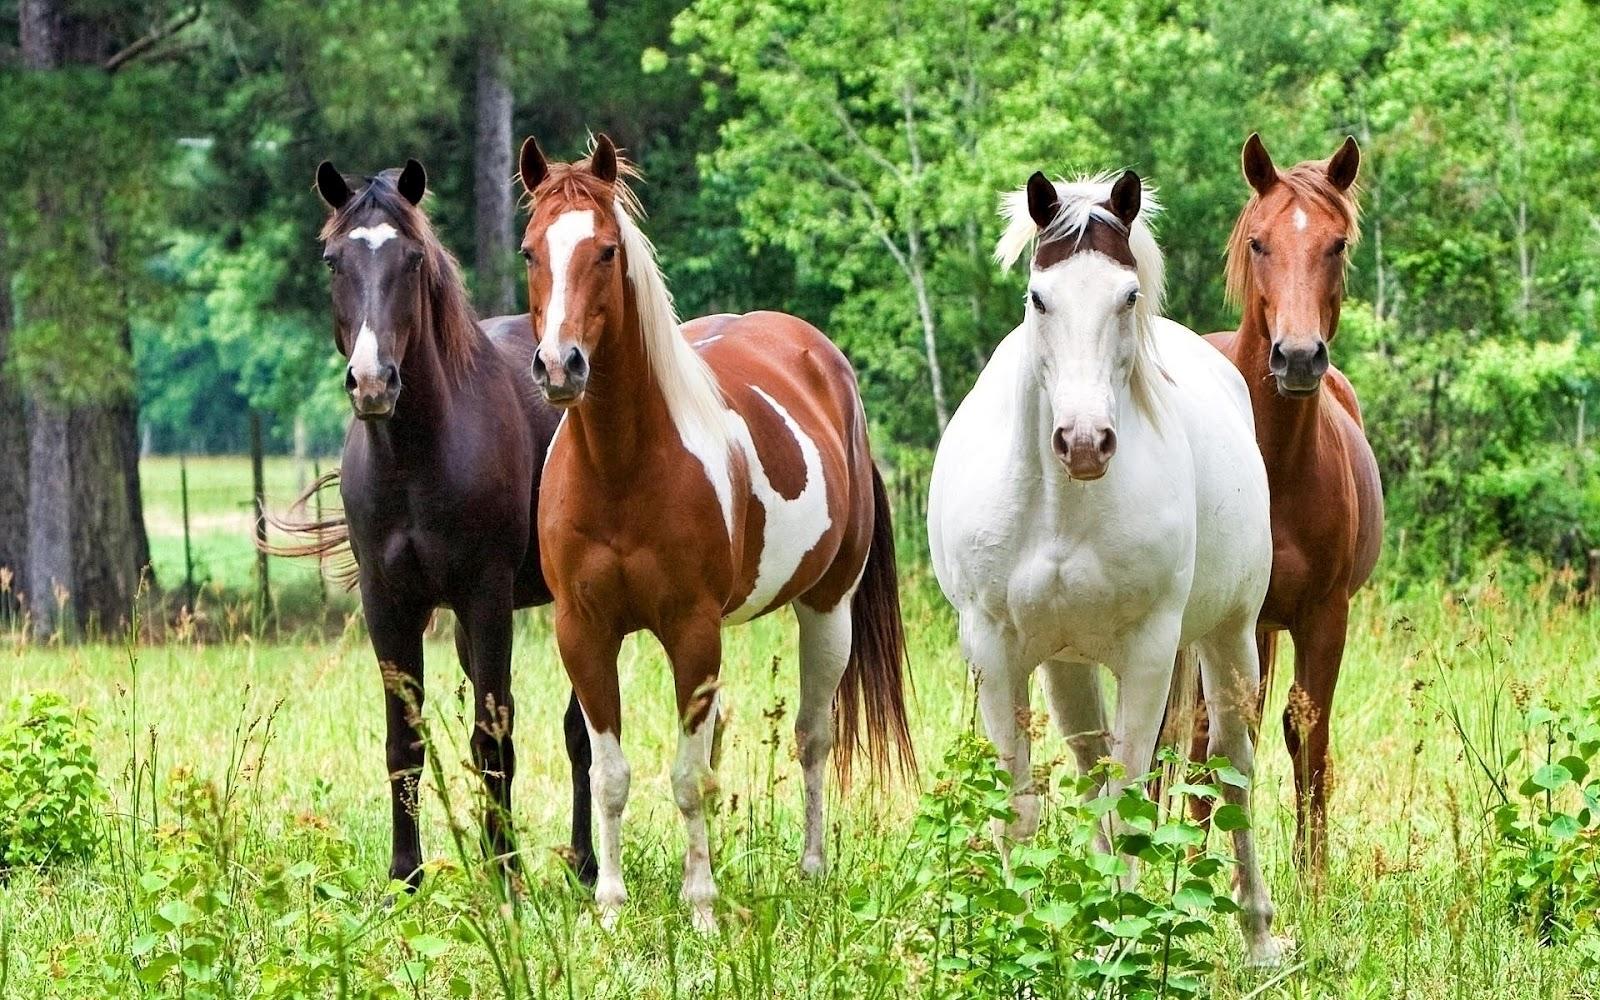 Simple   Wallpaper Horse Desktop Background - horse+wallpapers+hd+(12)  Best Photo Reference_56941.jpg